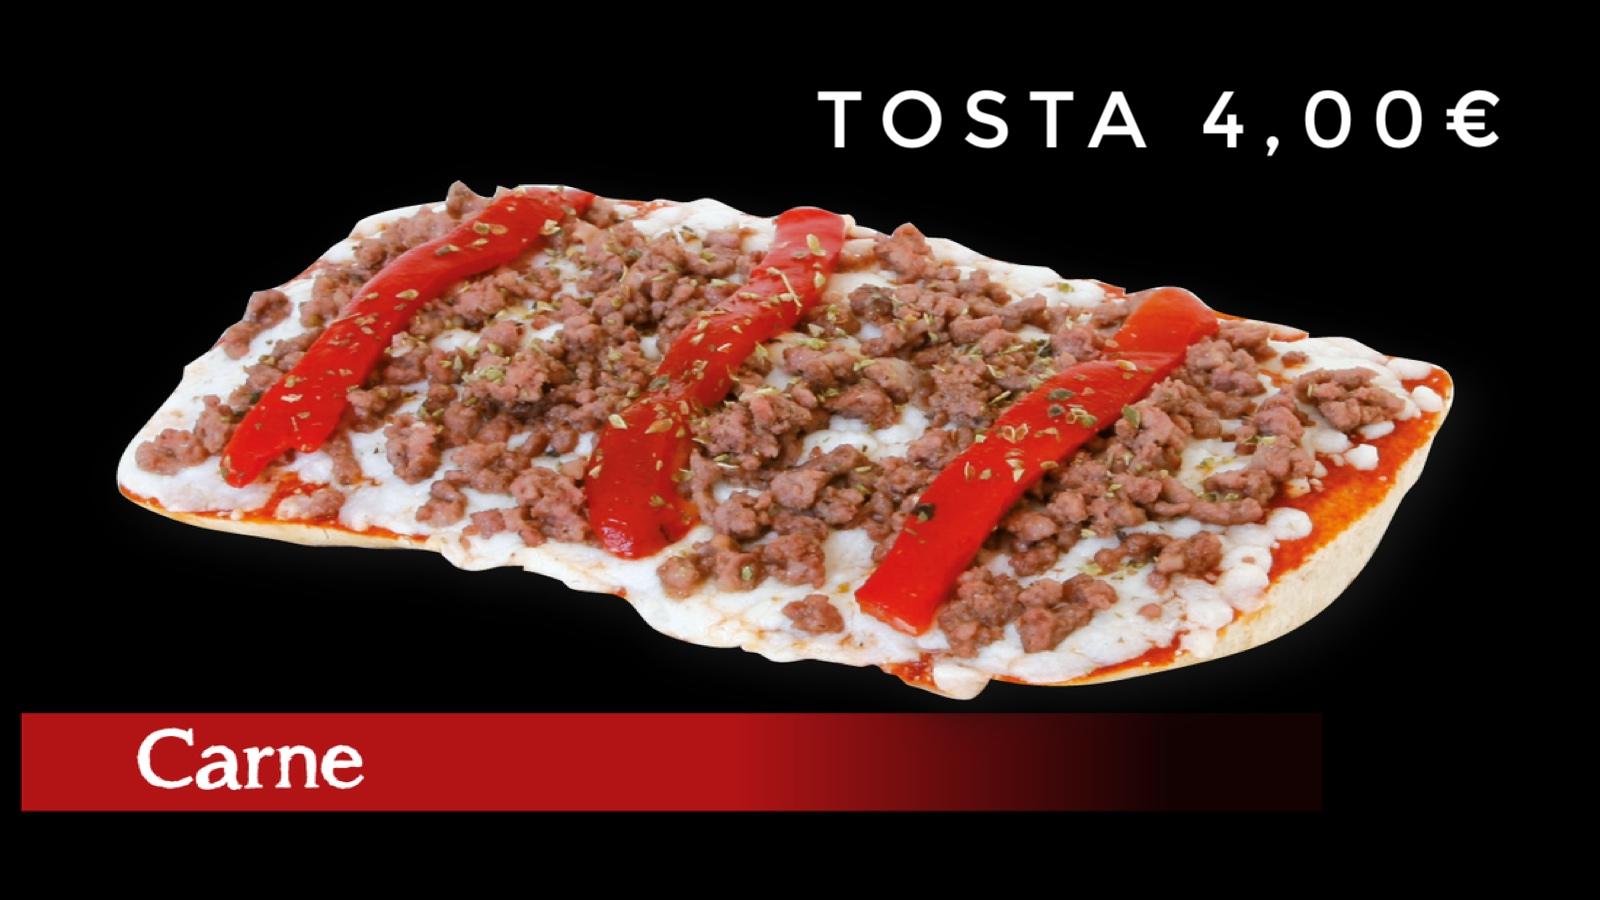 Tosta Carne Hotel Don Juan.jpg